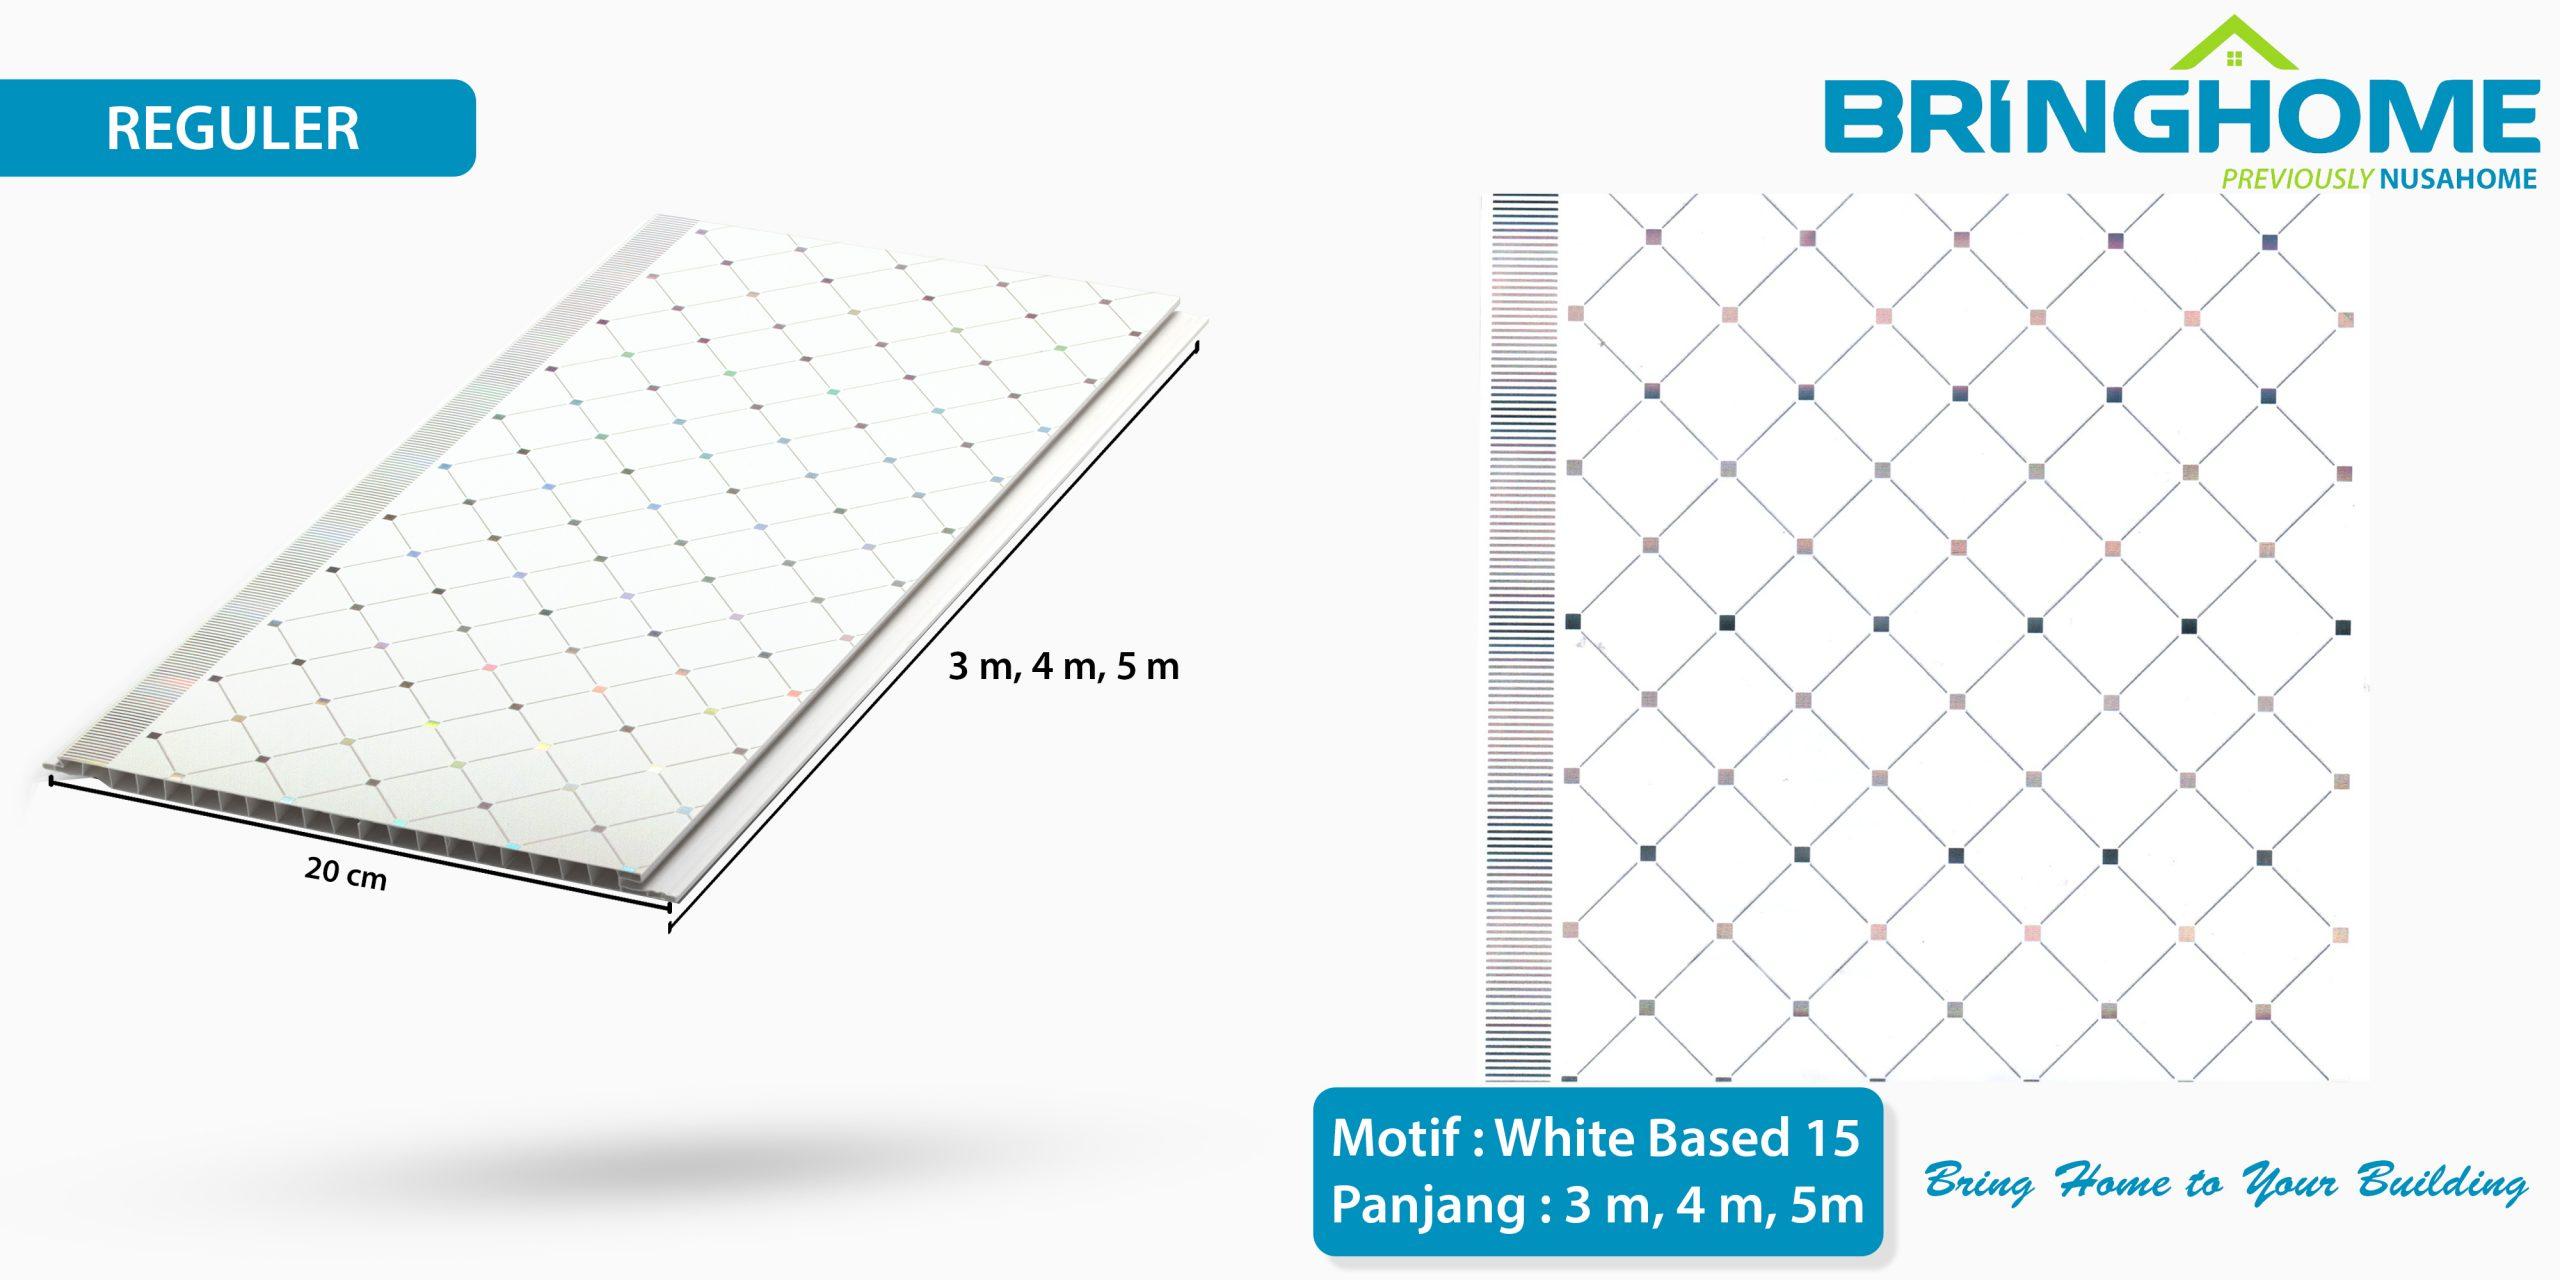 Motif White Based 15 Bringhome